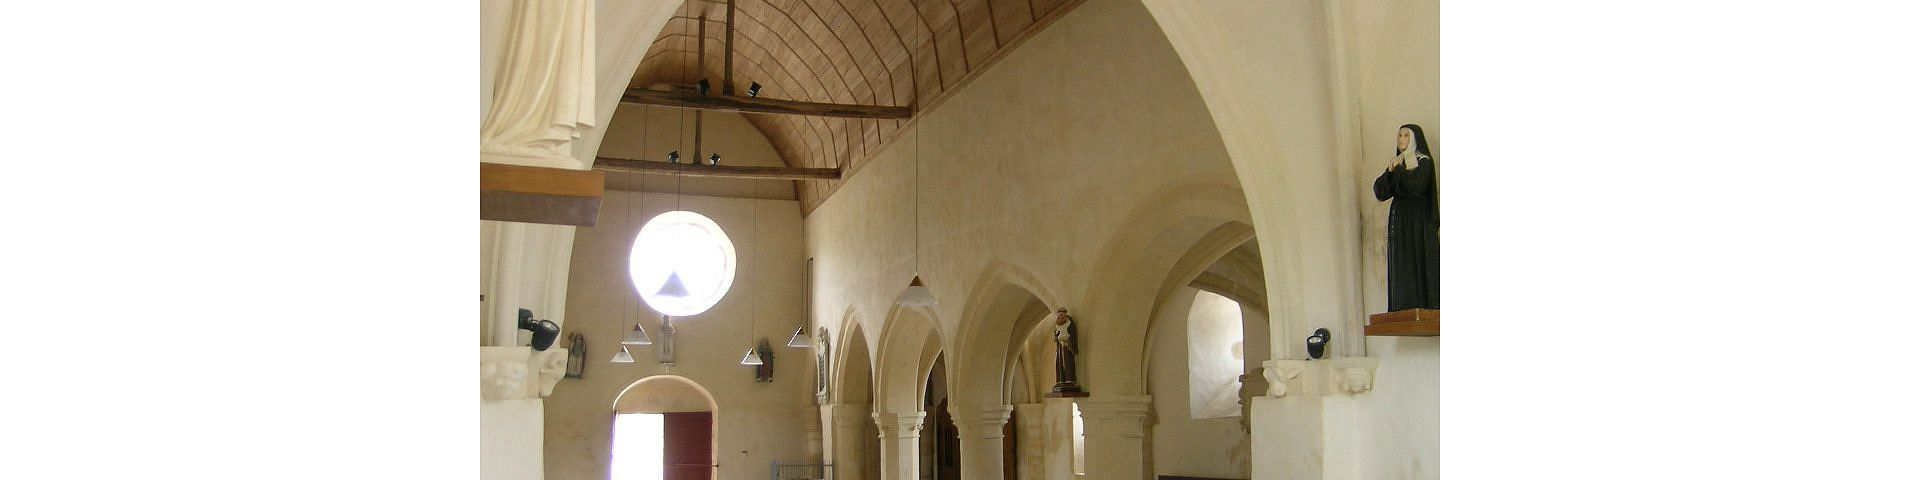 Asnois - Eglise Saint-Loup (58)